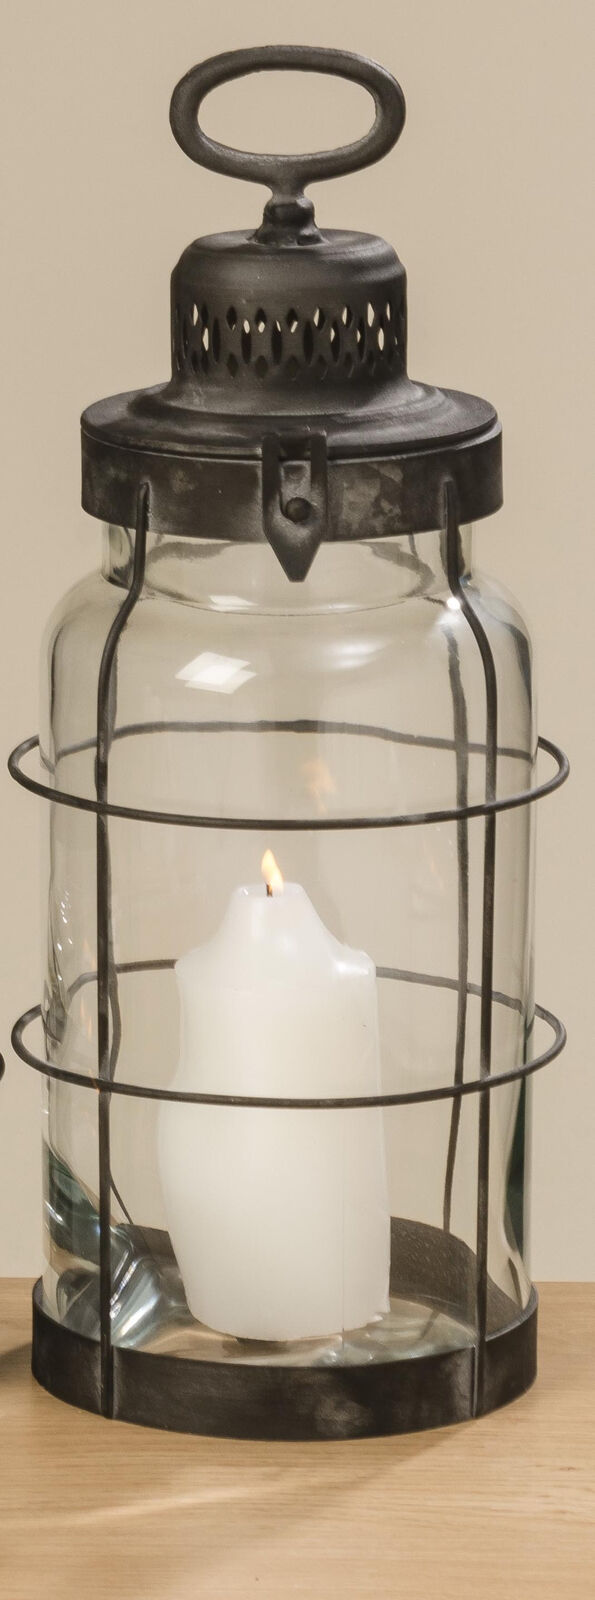 Linterna Odin Negro Metal Luz de Viento Farol Jardín 44cm Diseño Vintage Retro